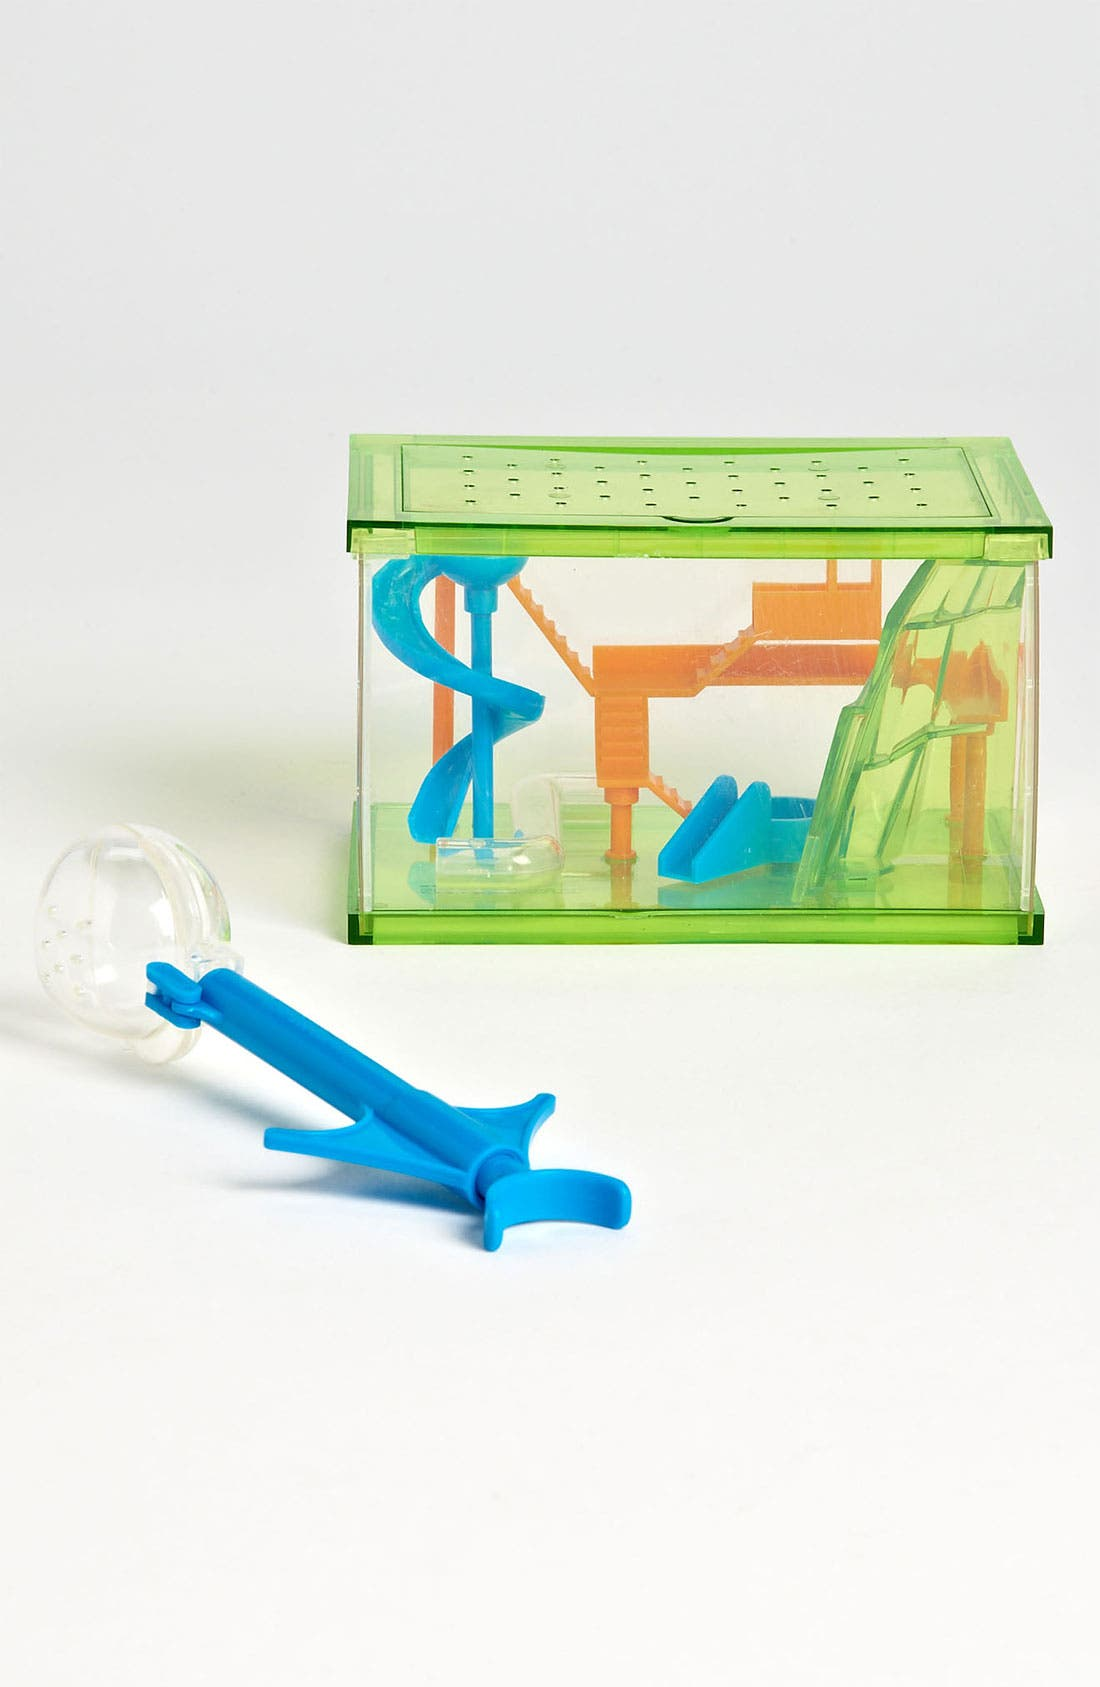 Alternate Image 1 Selected - Smart Lab 'Bug Playground' Kit